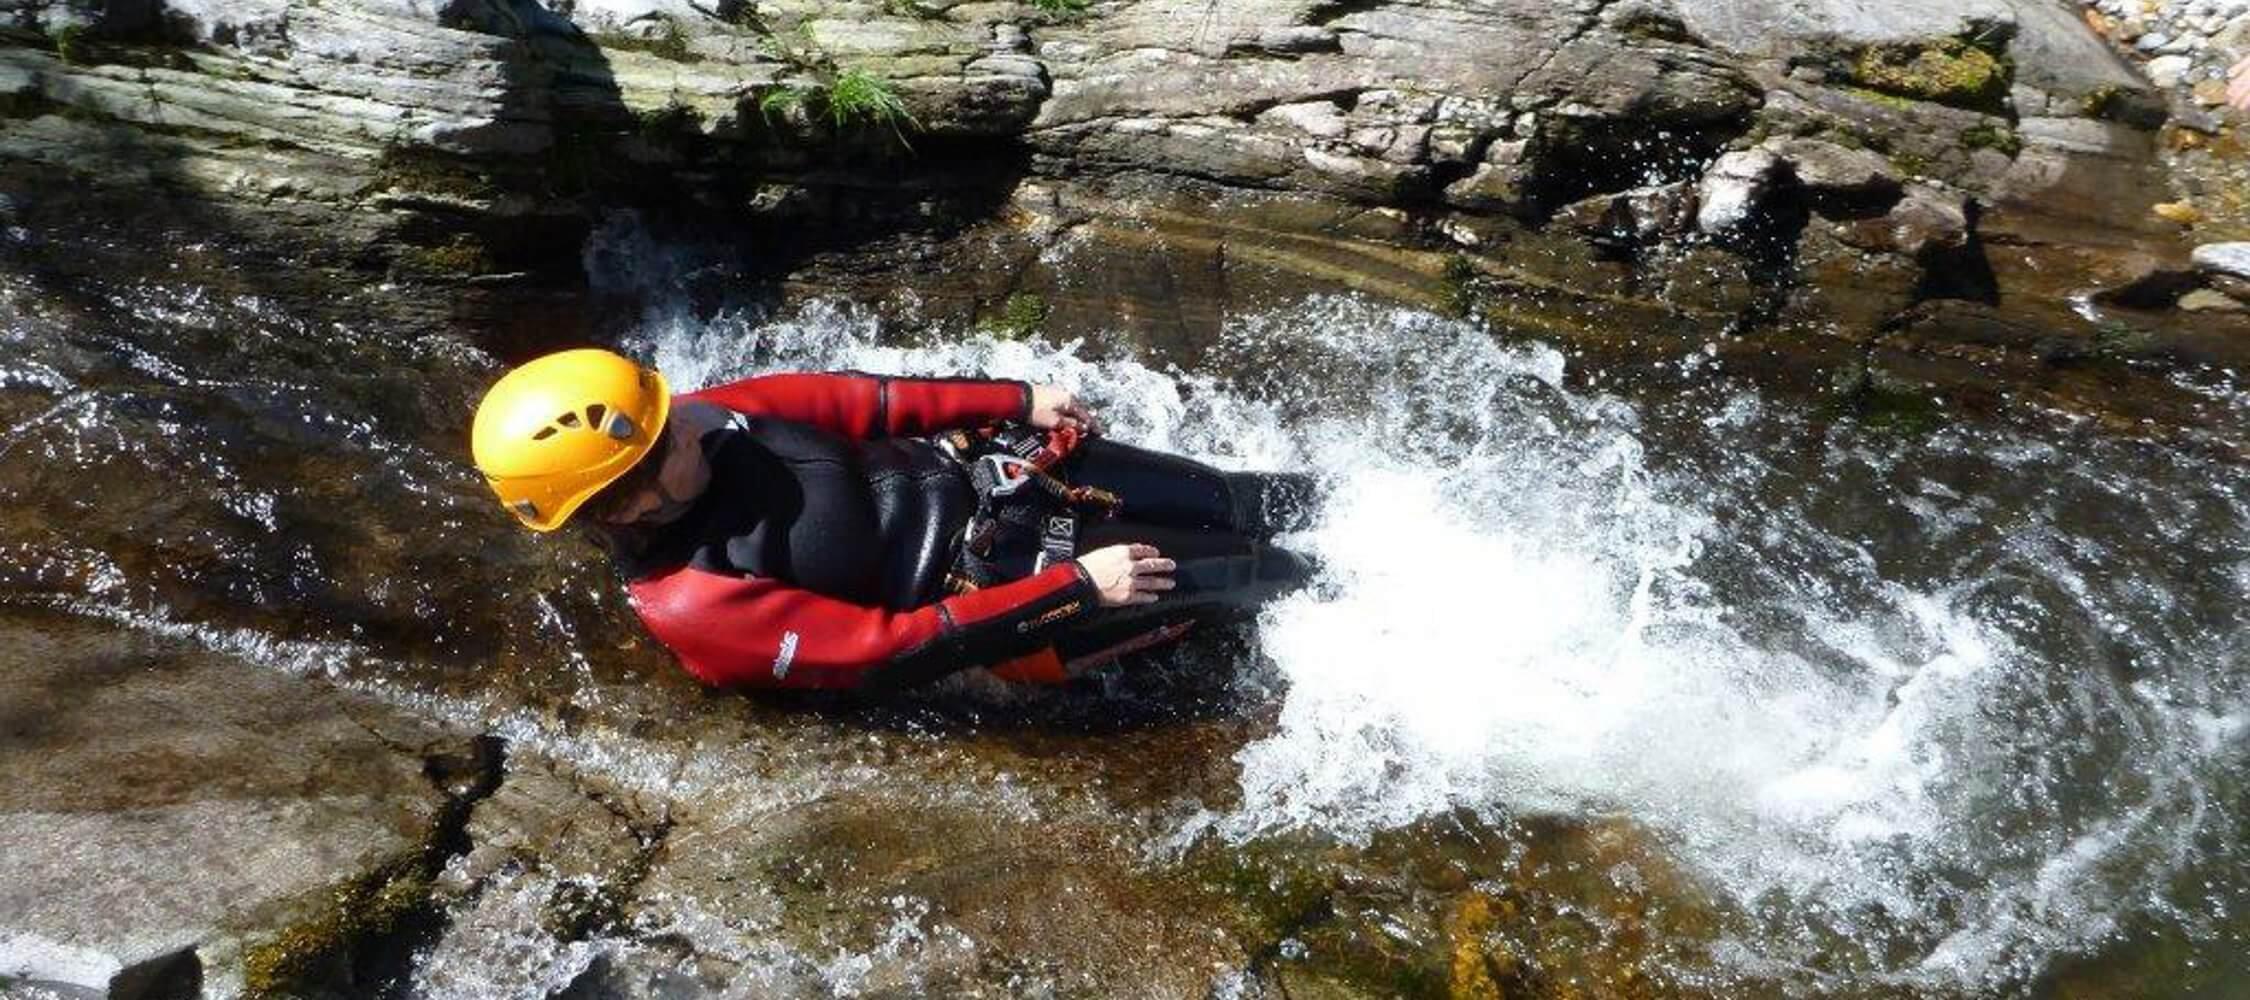 Italien-Trentino_Suedtirol_Alto_Adige_Merano_Meran_Natur_Sport_Sommer_Wasser_Rafting_Erwin-Mairginter_P1020223_2250x1000